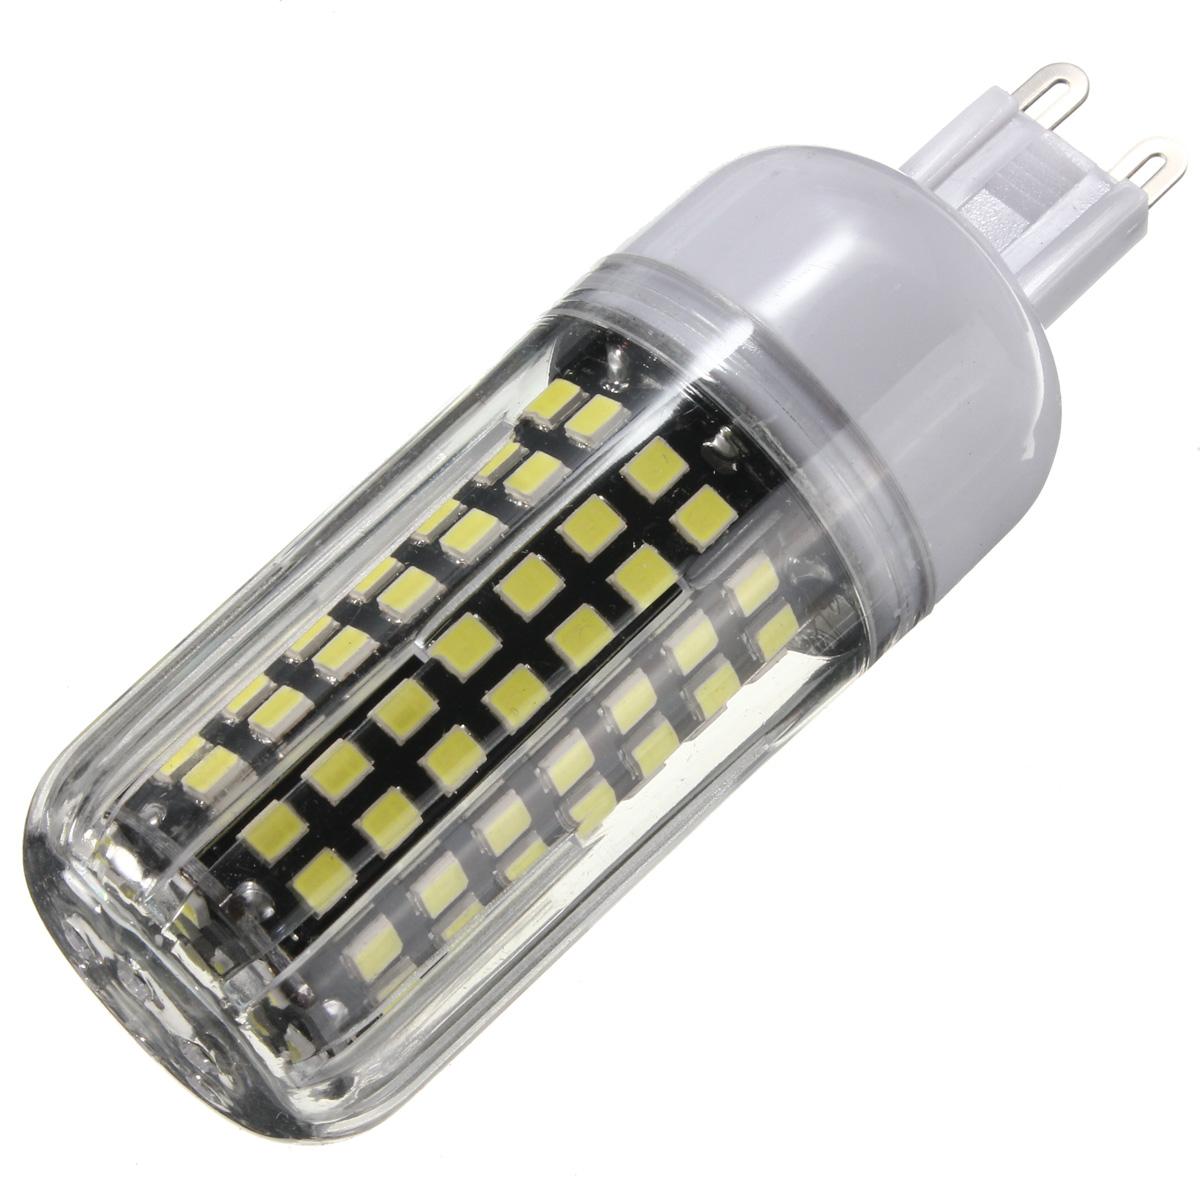 B22 E14 E27 G9 GU10 9W 112 SMD 2835 LED Cover Corn White Warm White Lamp Bulb Non-Dimmable AC220V